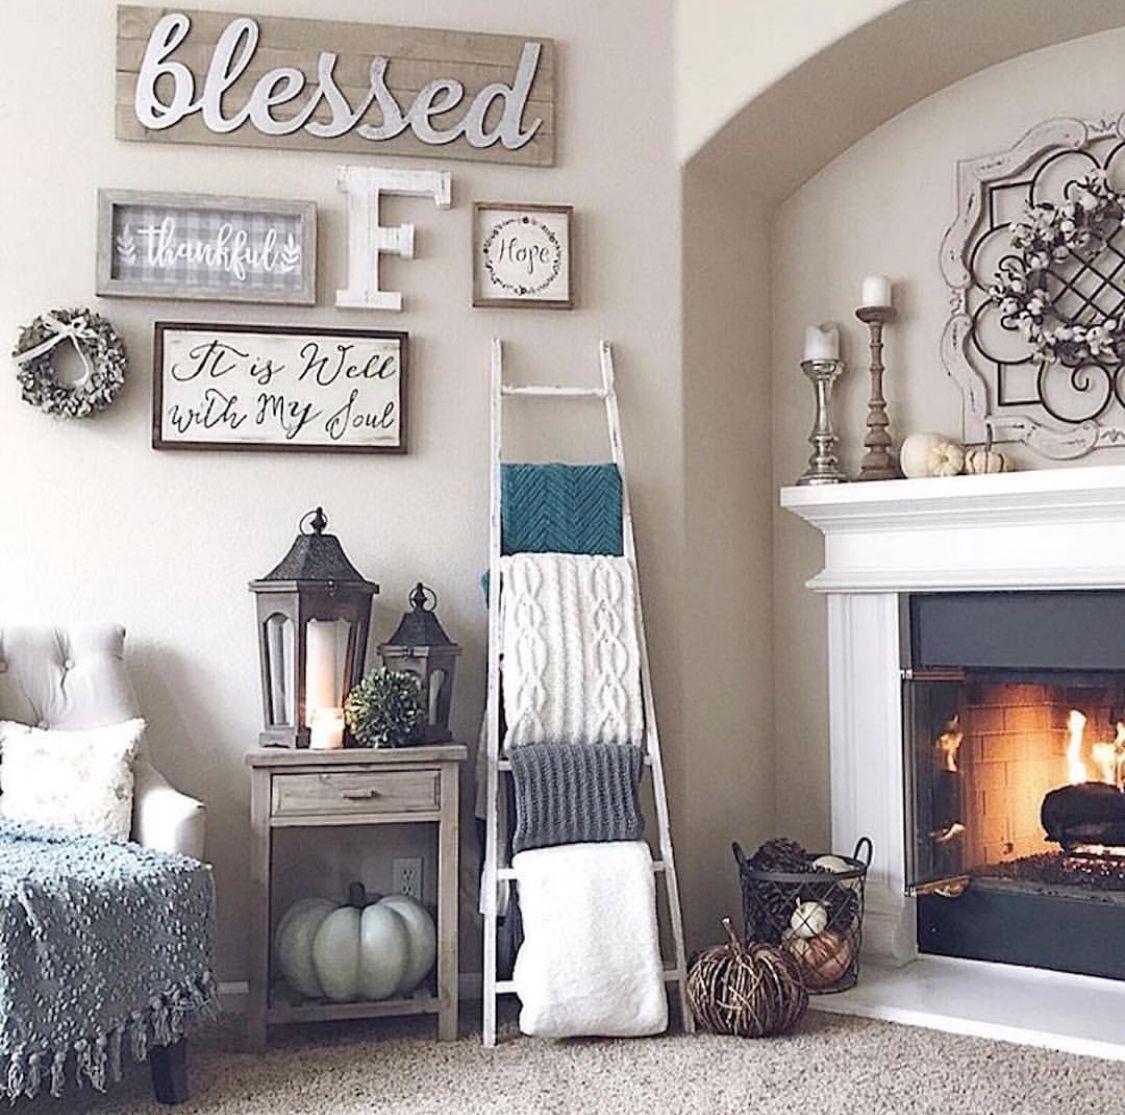 Kirklands Living Room Decor - Home Design & Decoration Ideas on Kirkland's Decor Home Accents id=35806